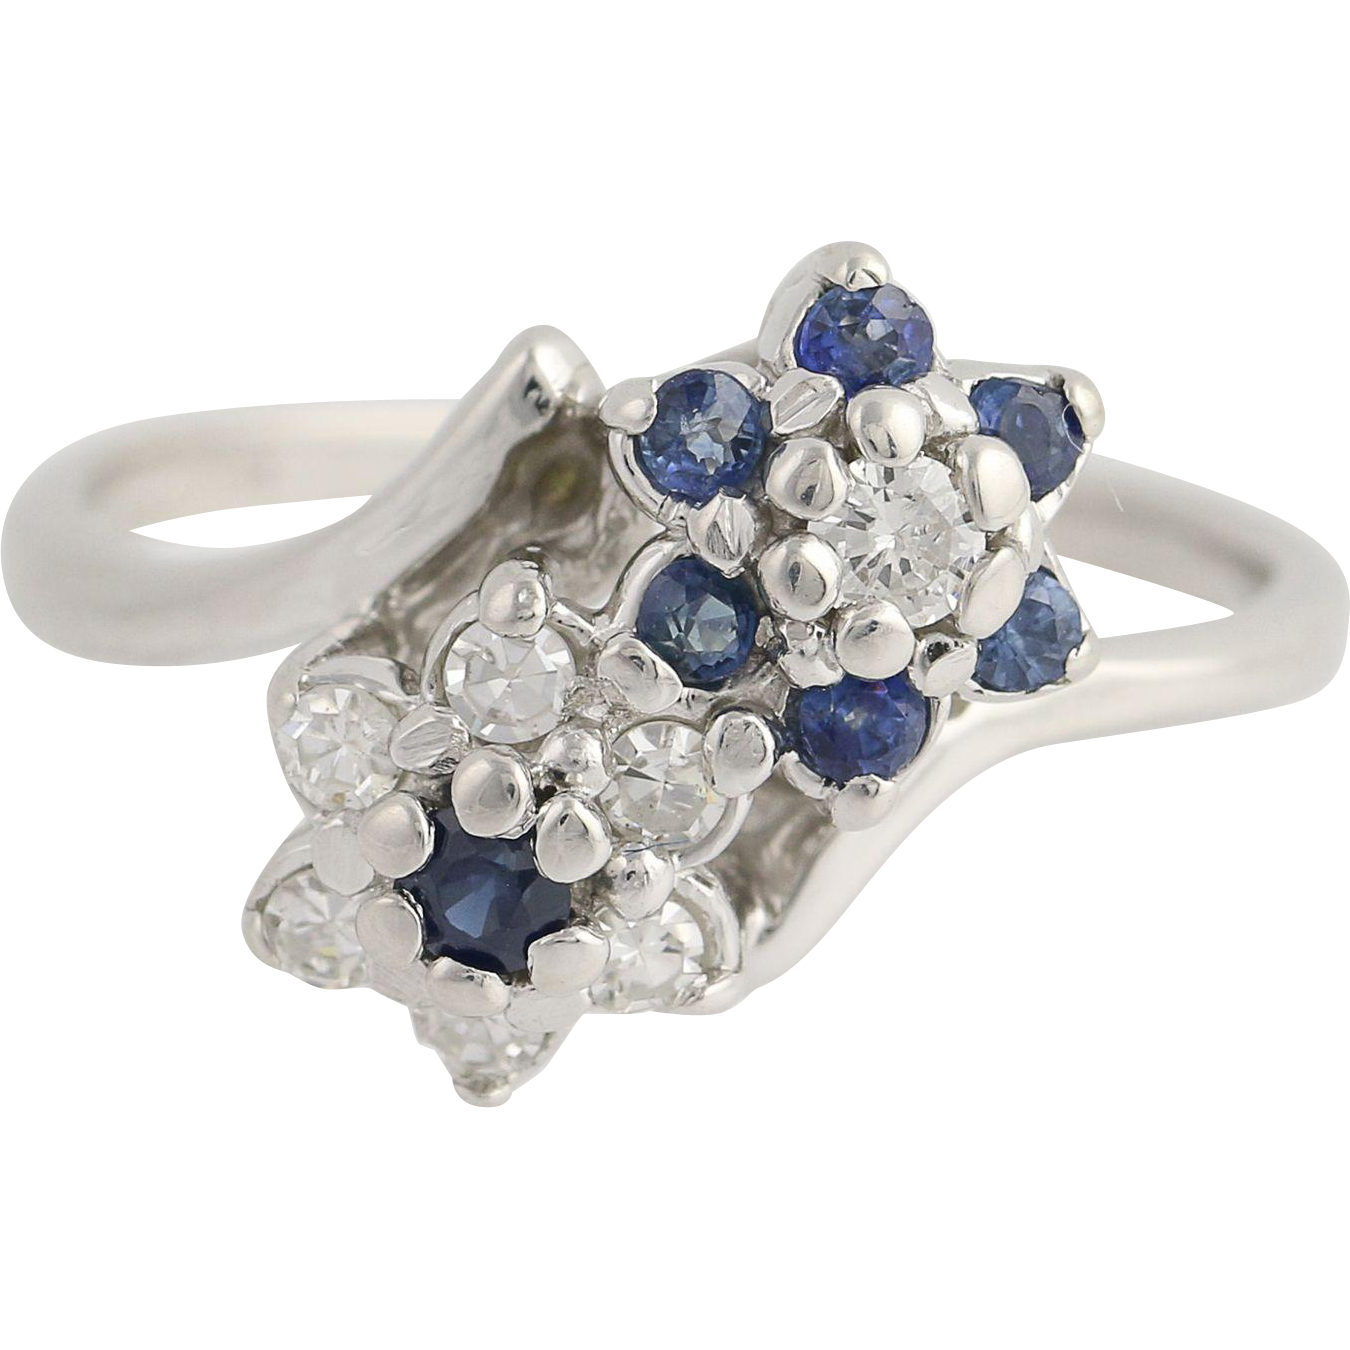 Floral Sapphire & Diamond Bypass Ring - 14k White Gold April September .51ctw